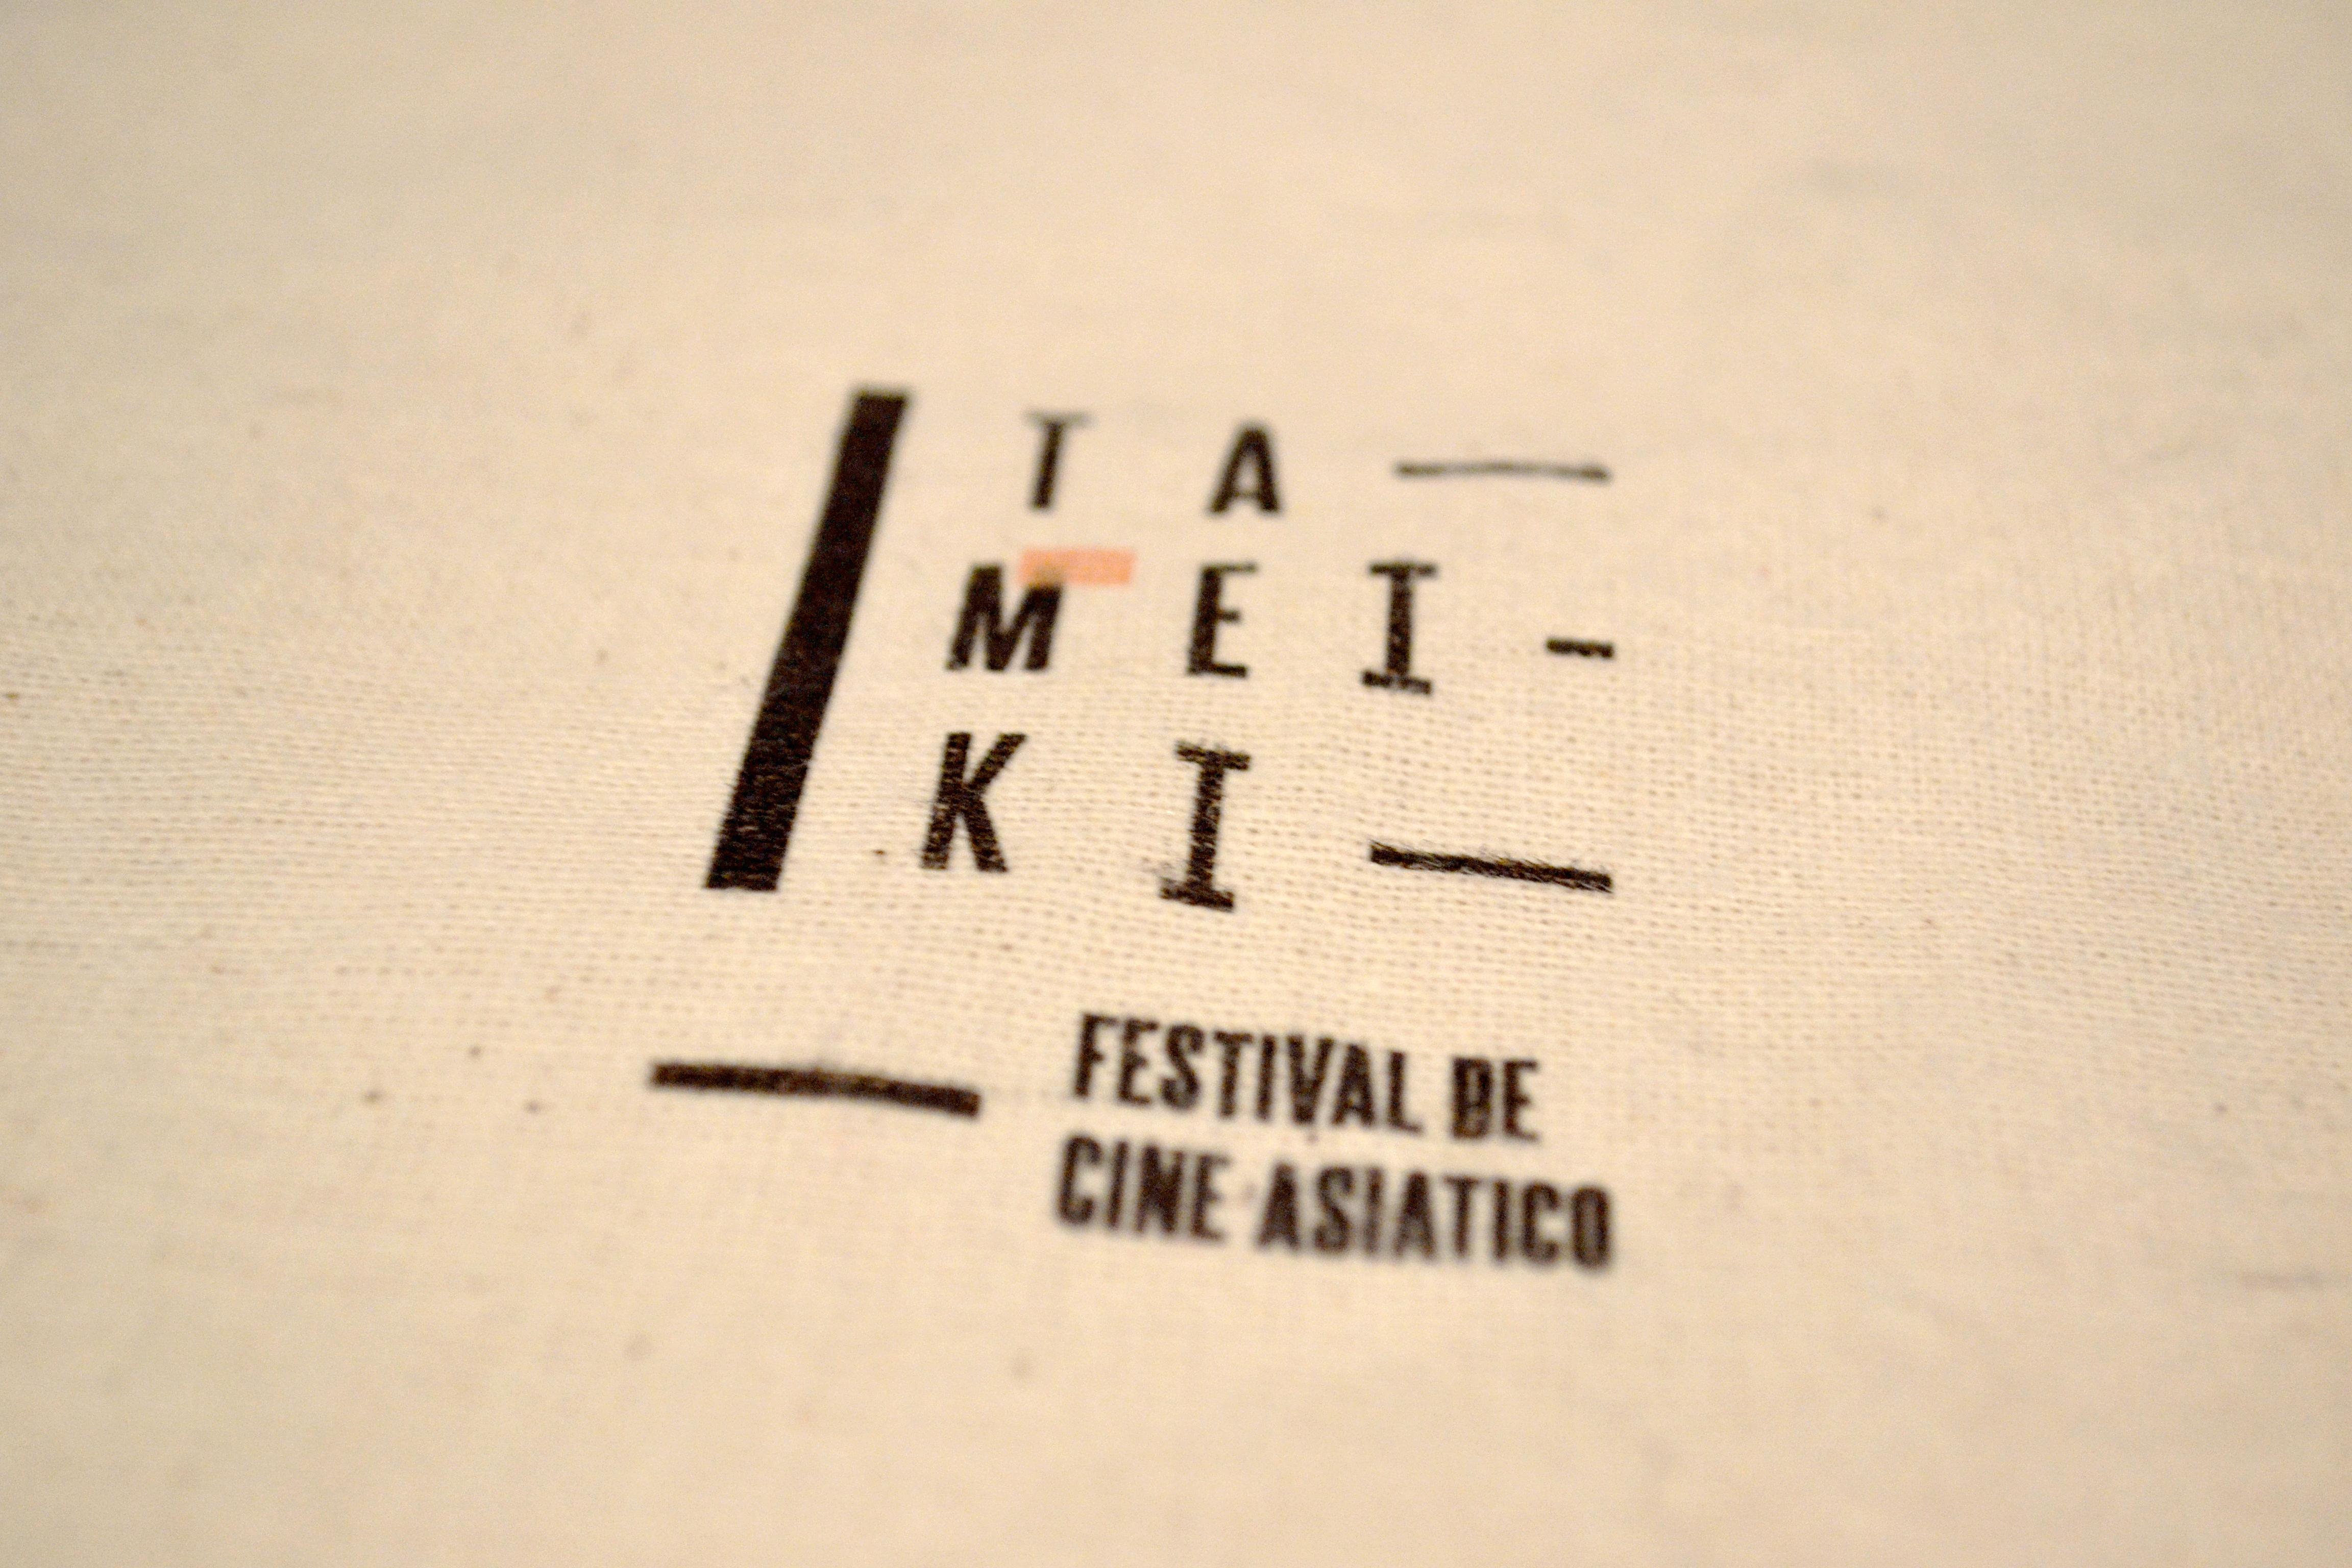 TAMEIKI ; festival de cine asiático